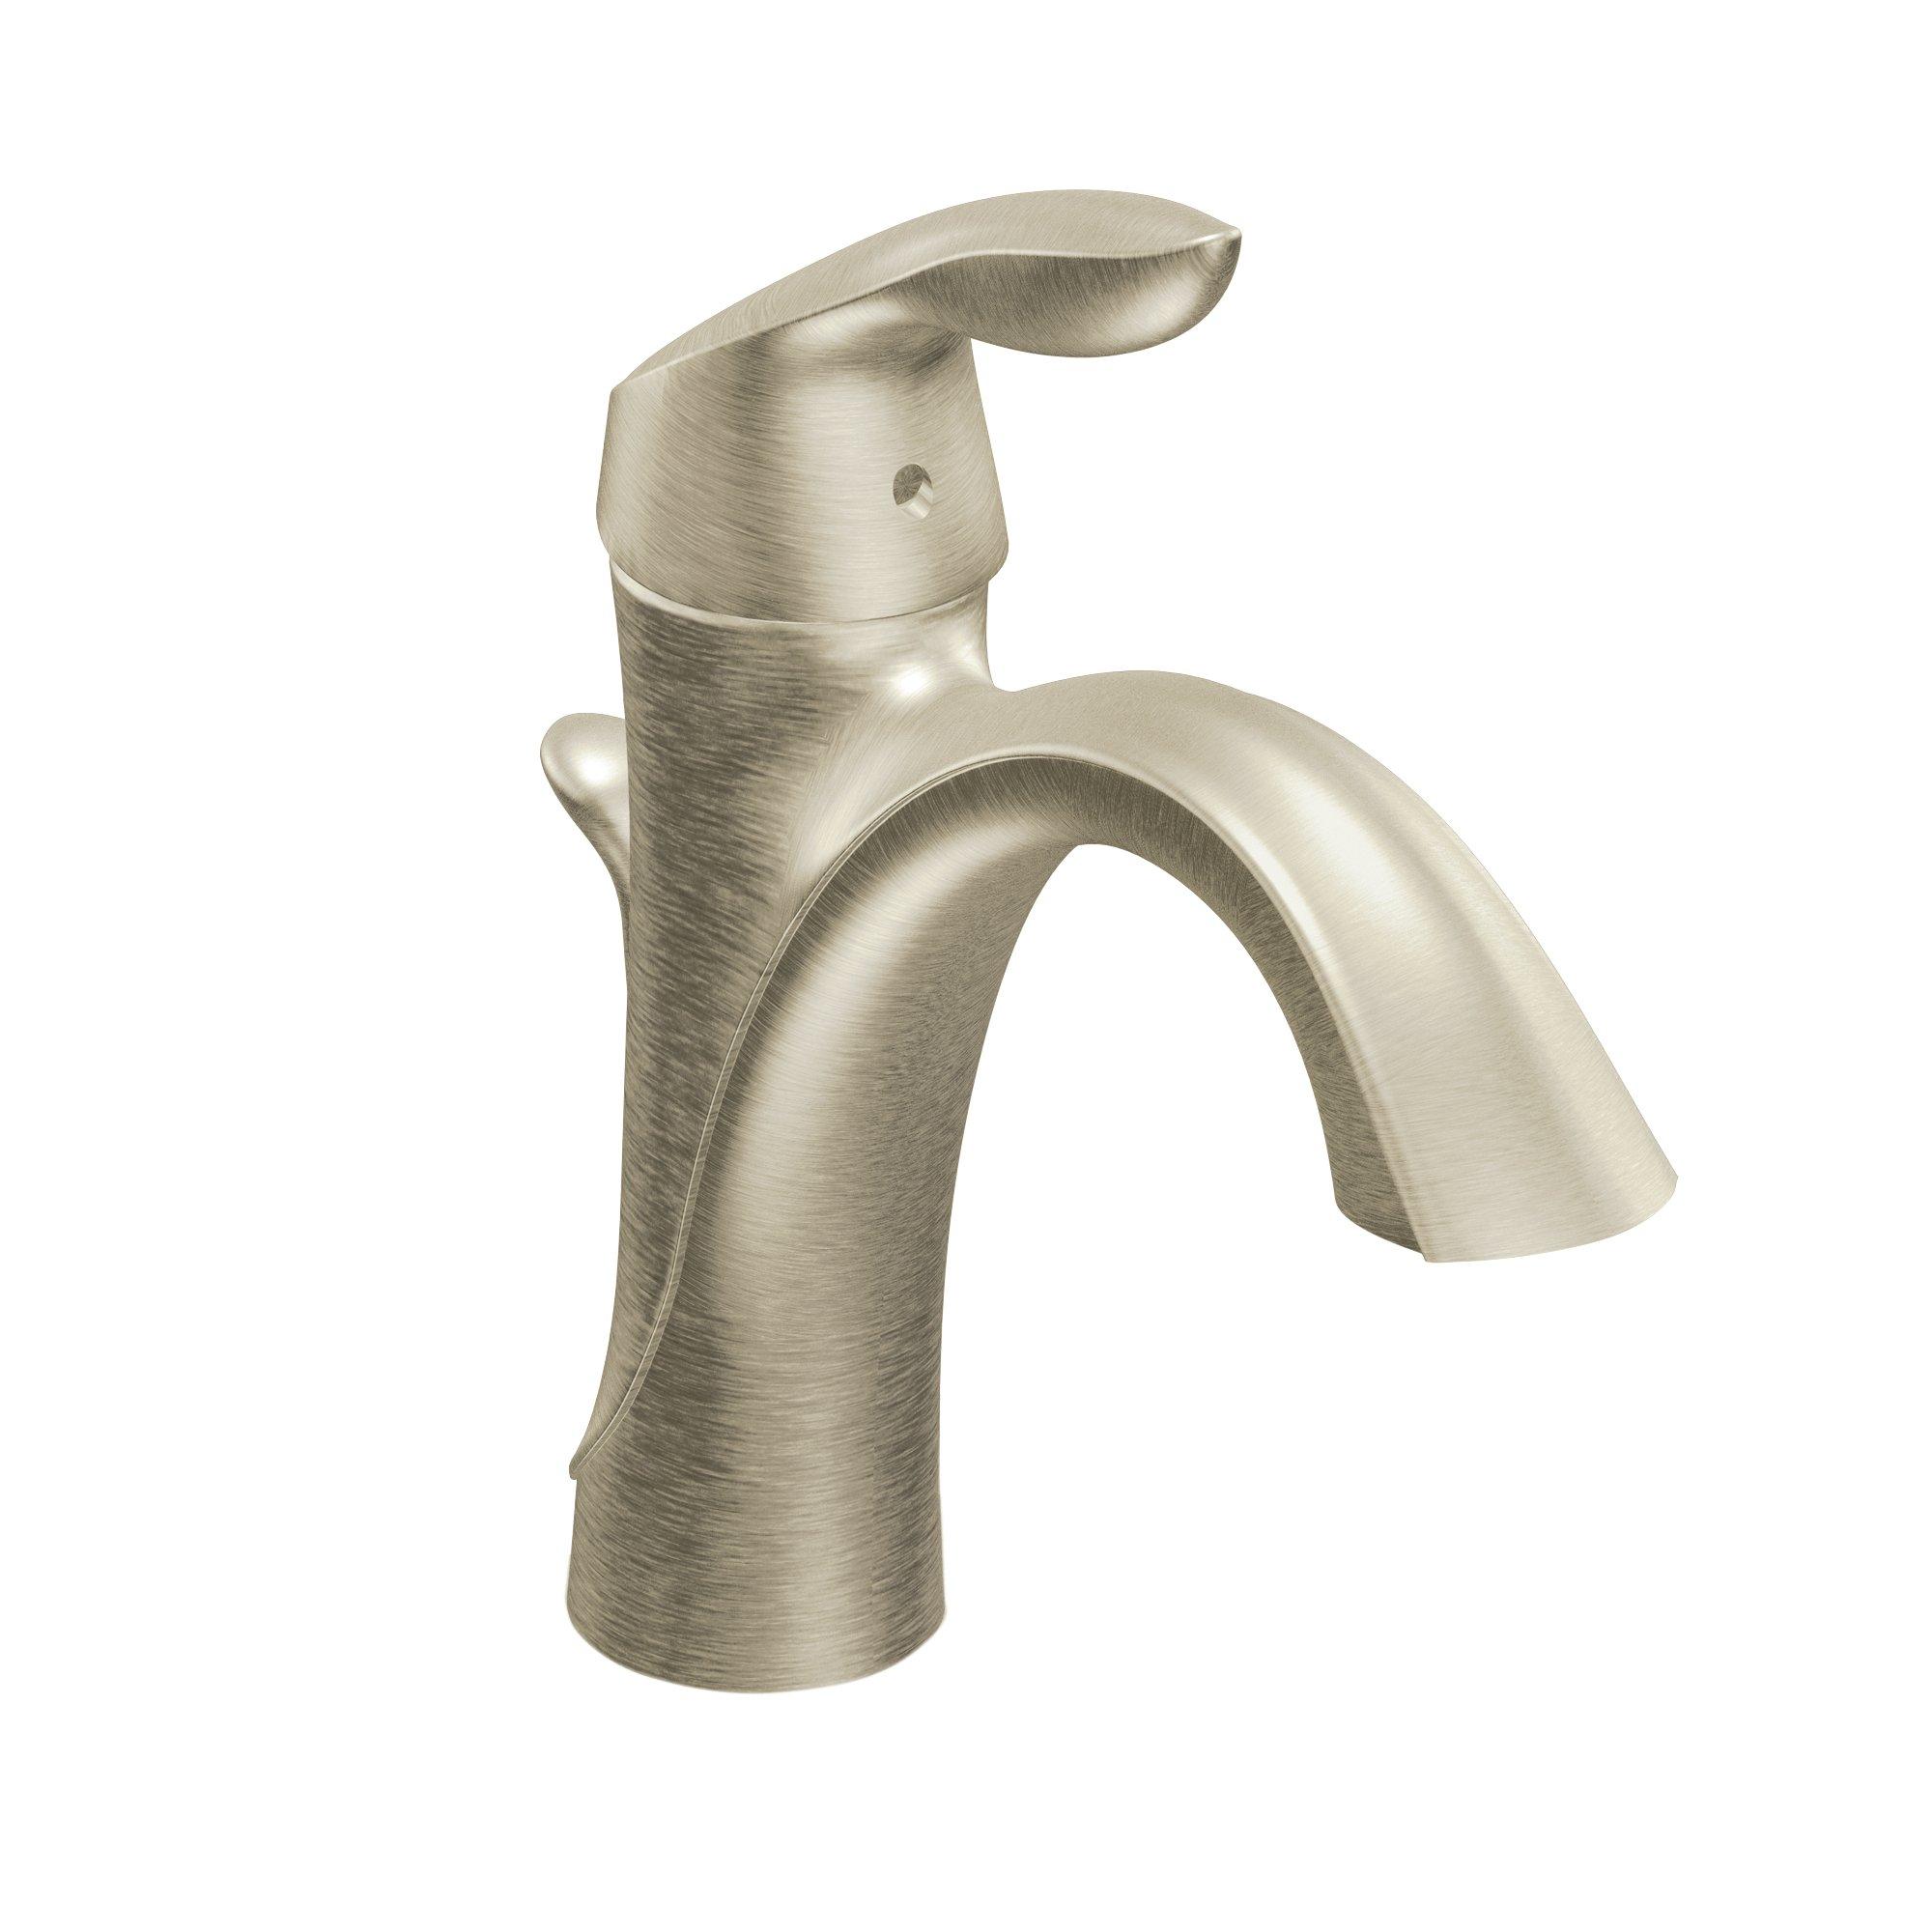 Moen Eva One-Handle High Arc Bathroom Faucet, Brushed Nickel (6400BN) by Moen